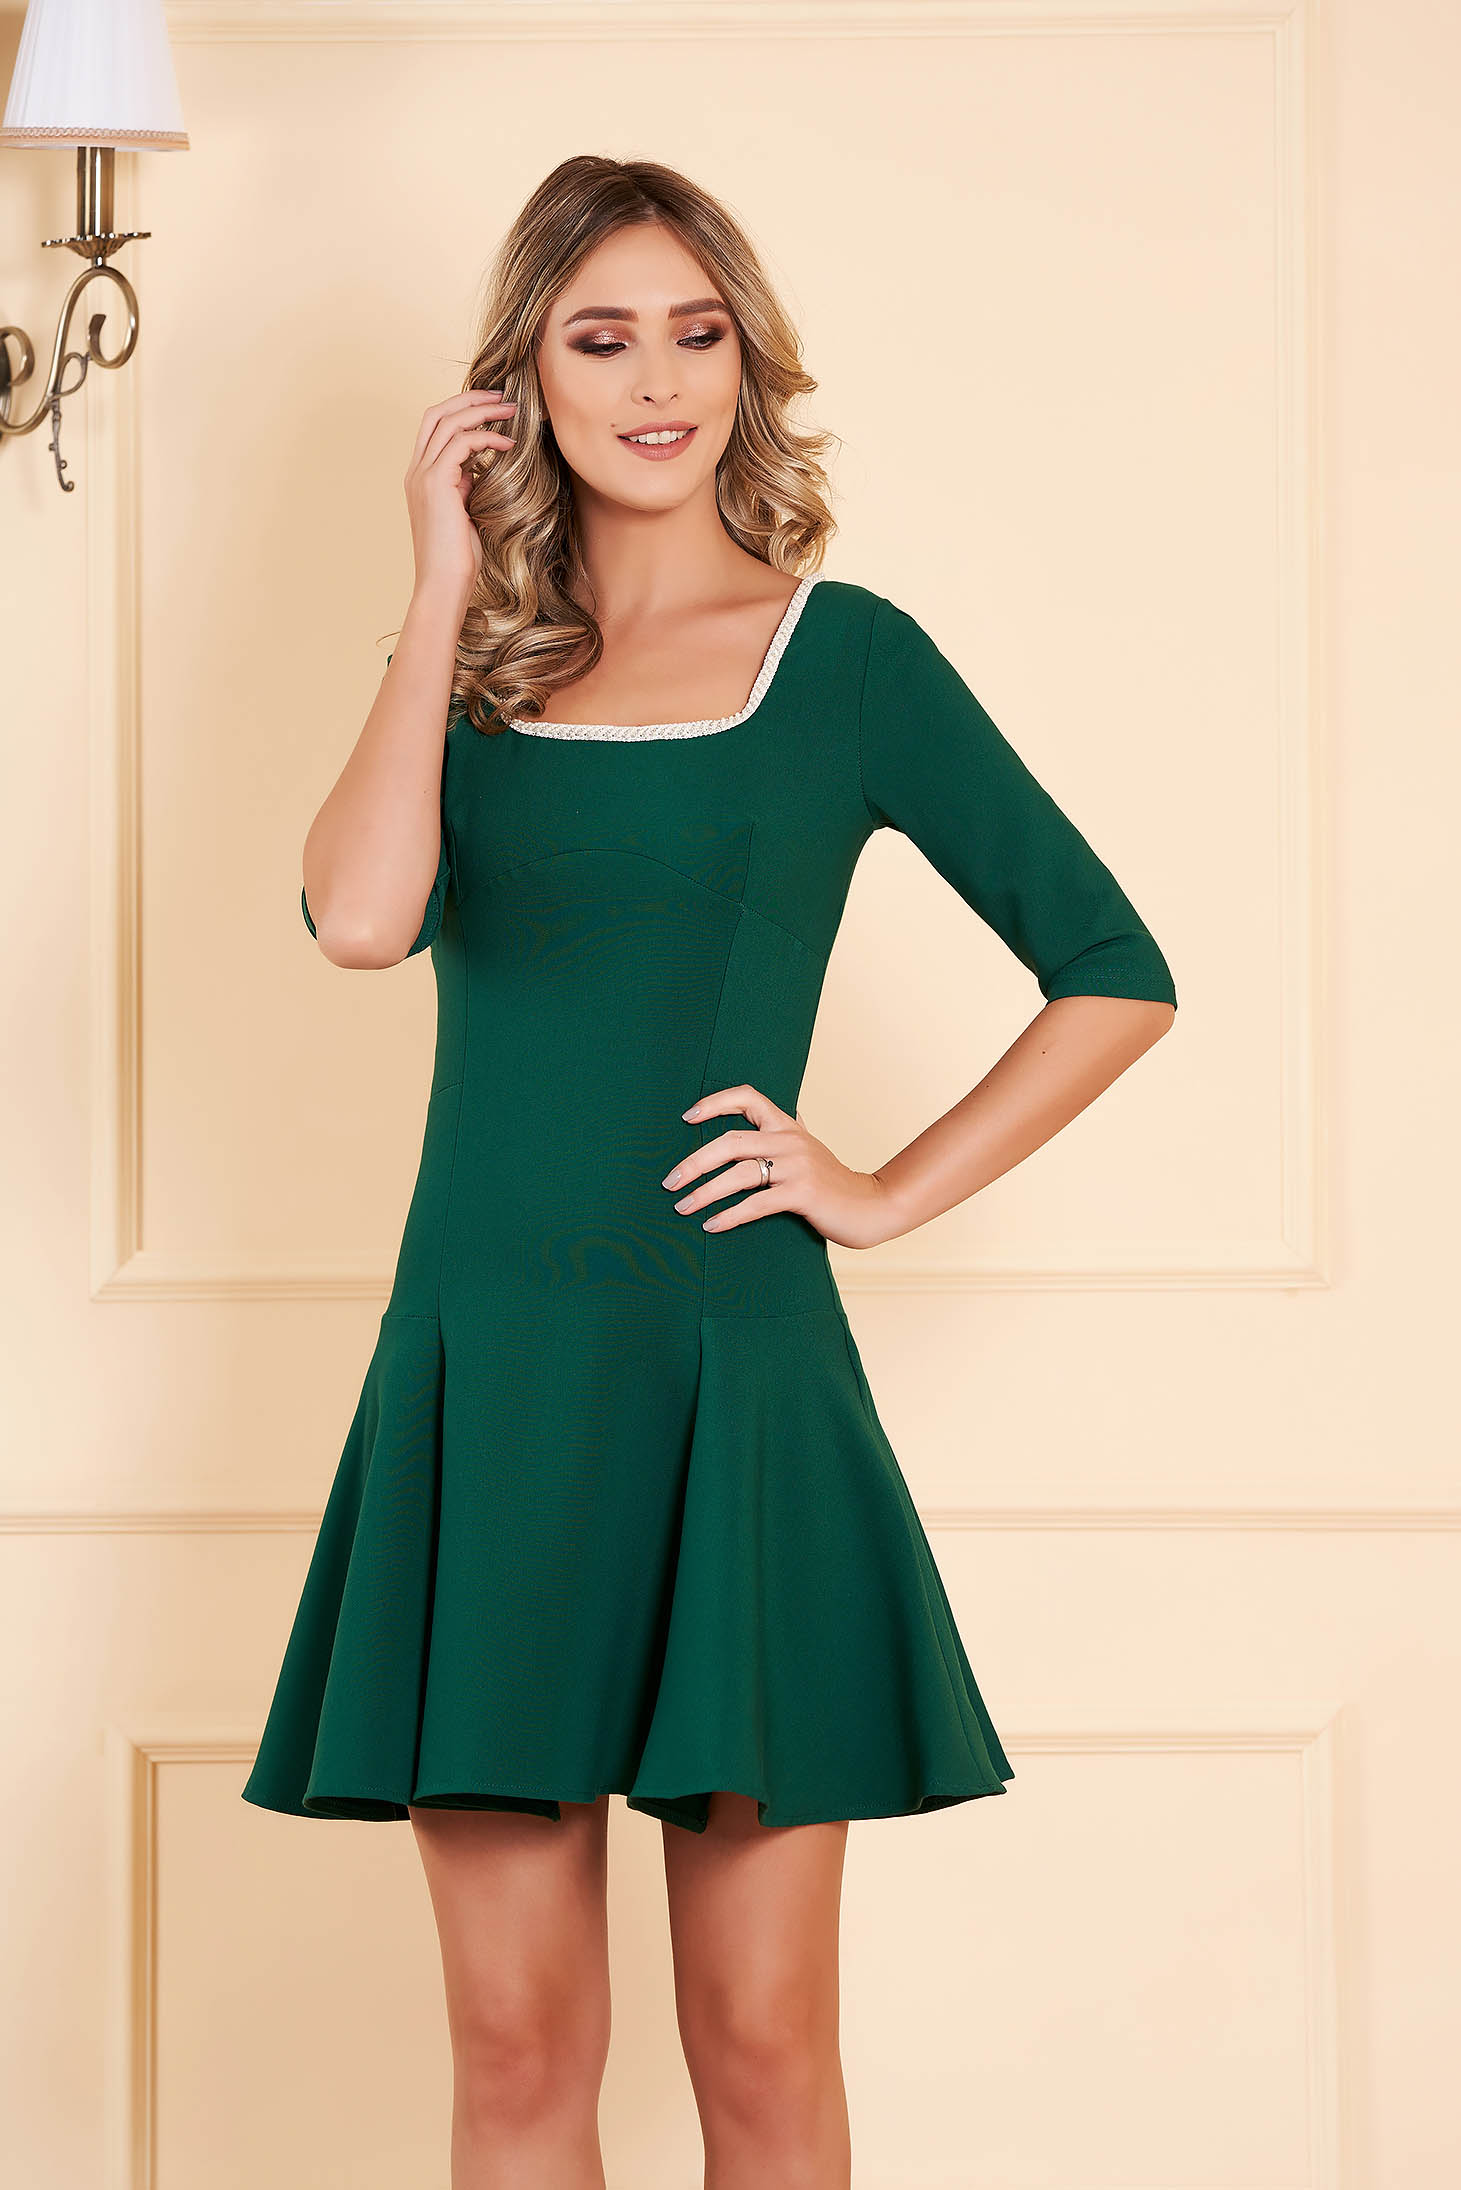 Rochie Artista verde de ocazie croi in clos scurta din stofa usor elastica cu maneci trei-sferturi